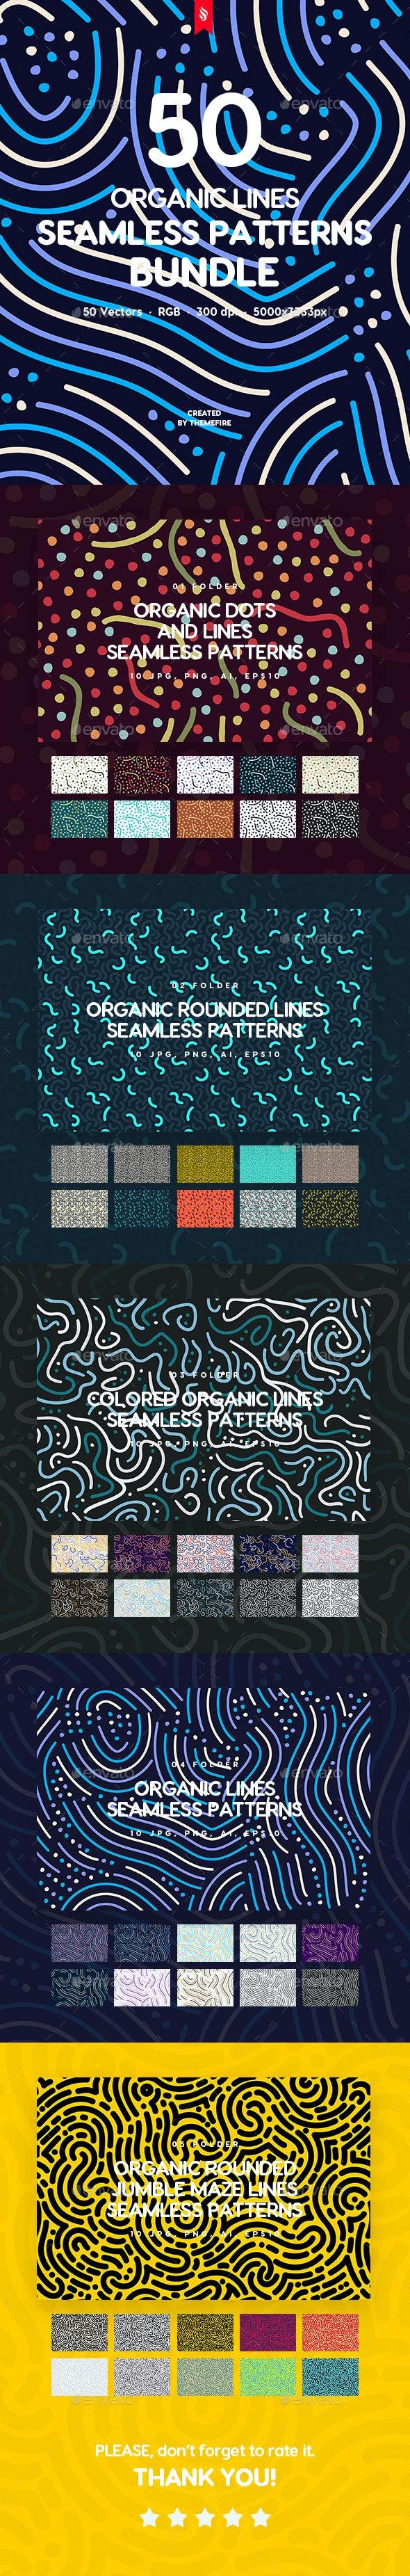 50 Organic Lines Seamless Patterns Bundle - Patterns Backgrounds